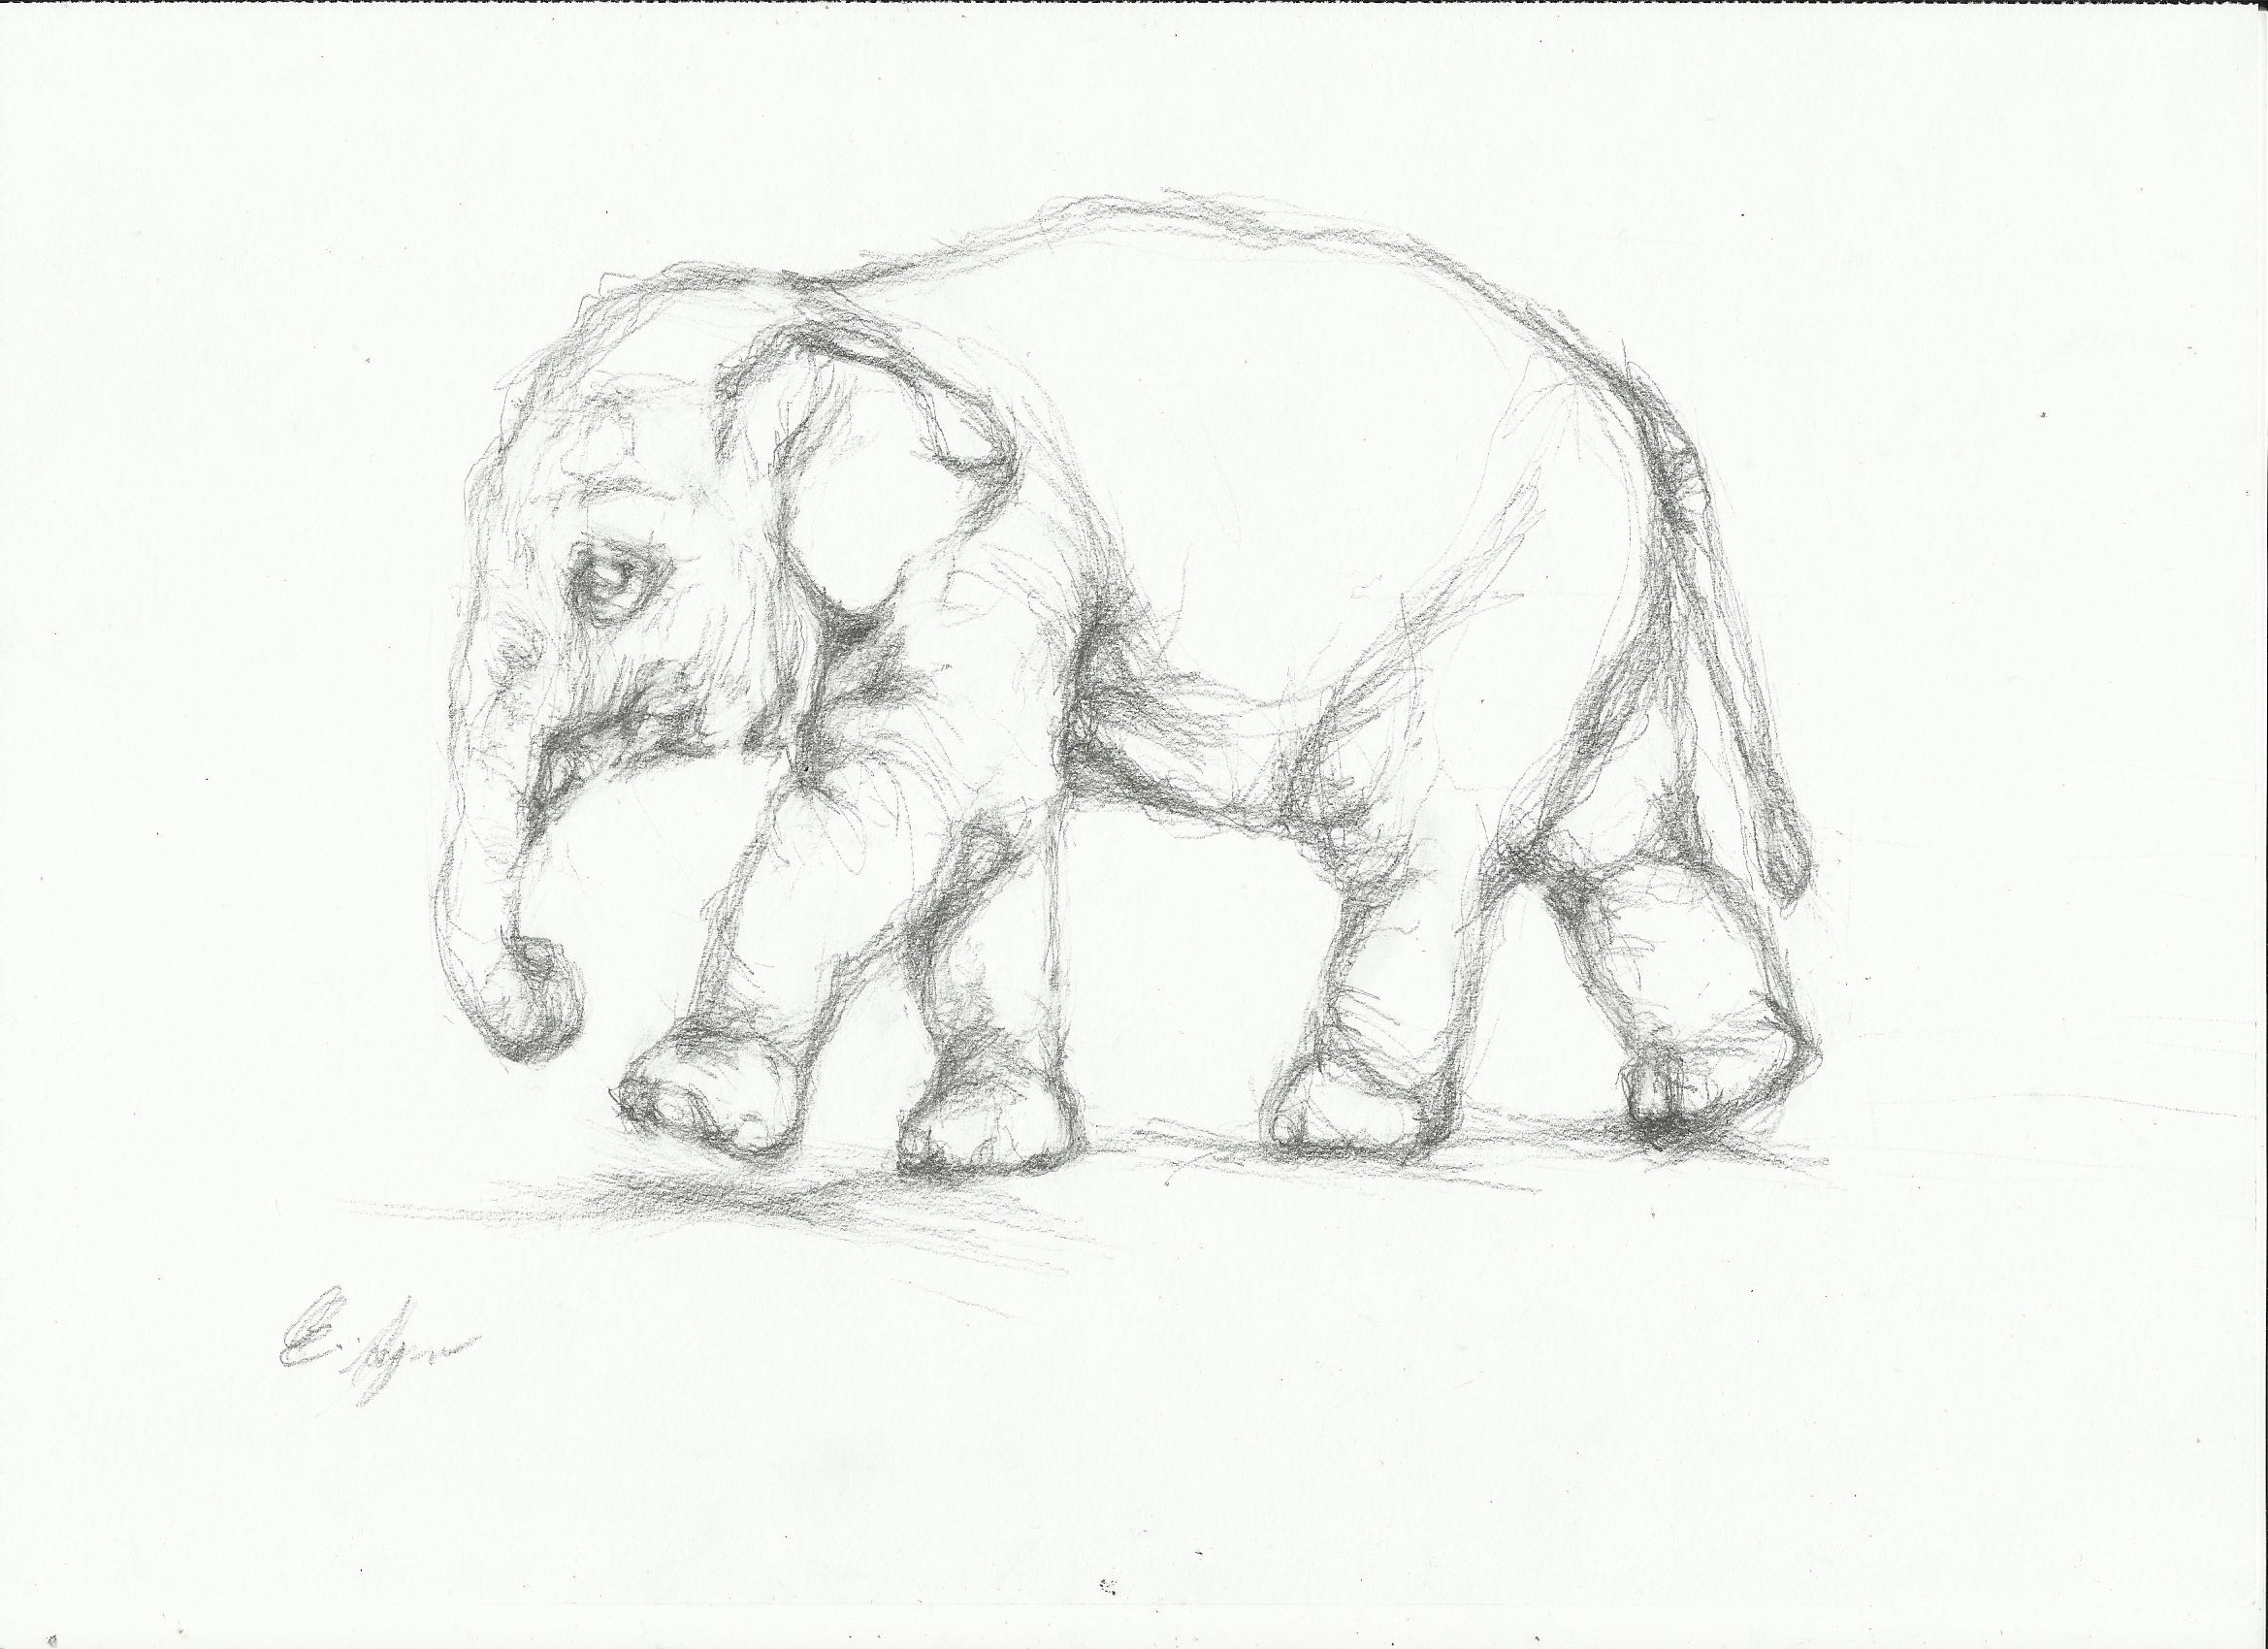 2338x1700 Sketches Of Elephants Pencil Elephant Pencil Sketch Royalty Free